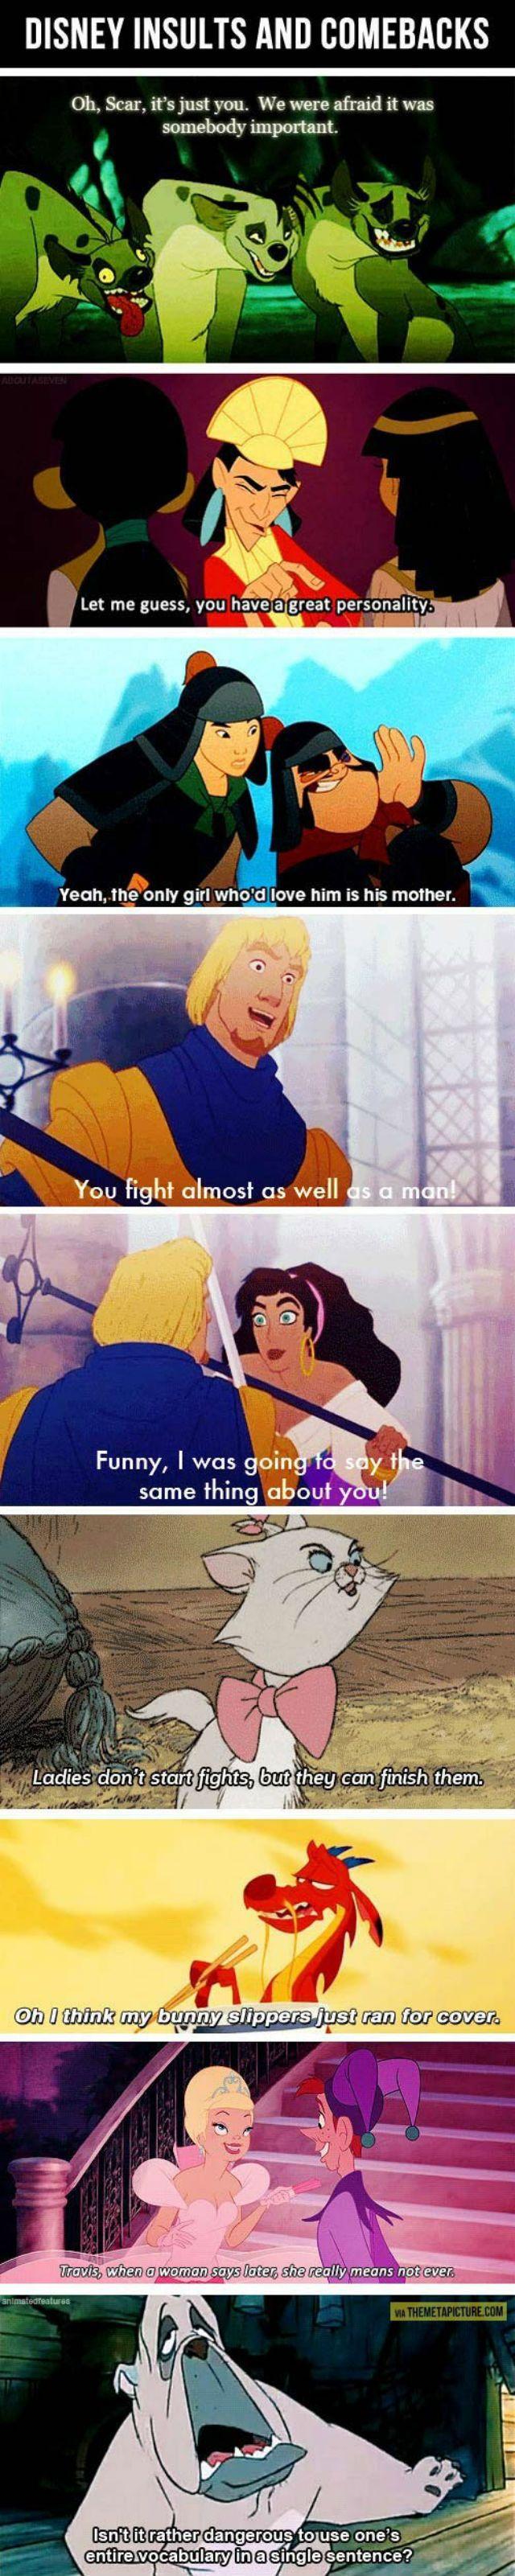 The Best And Wittiest Disney Comebacks…